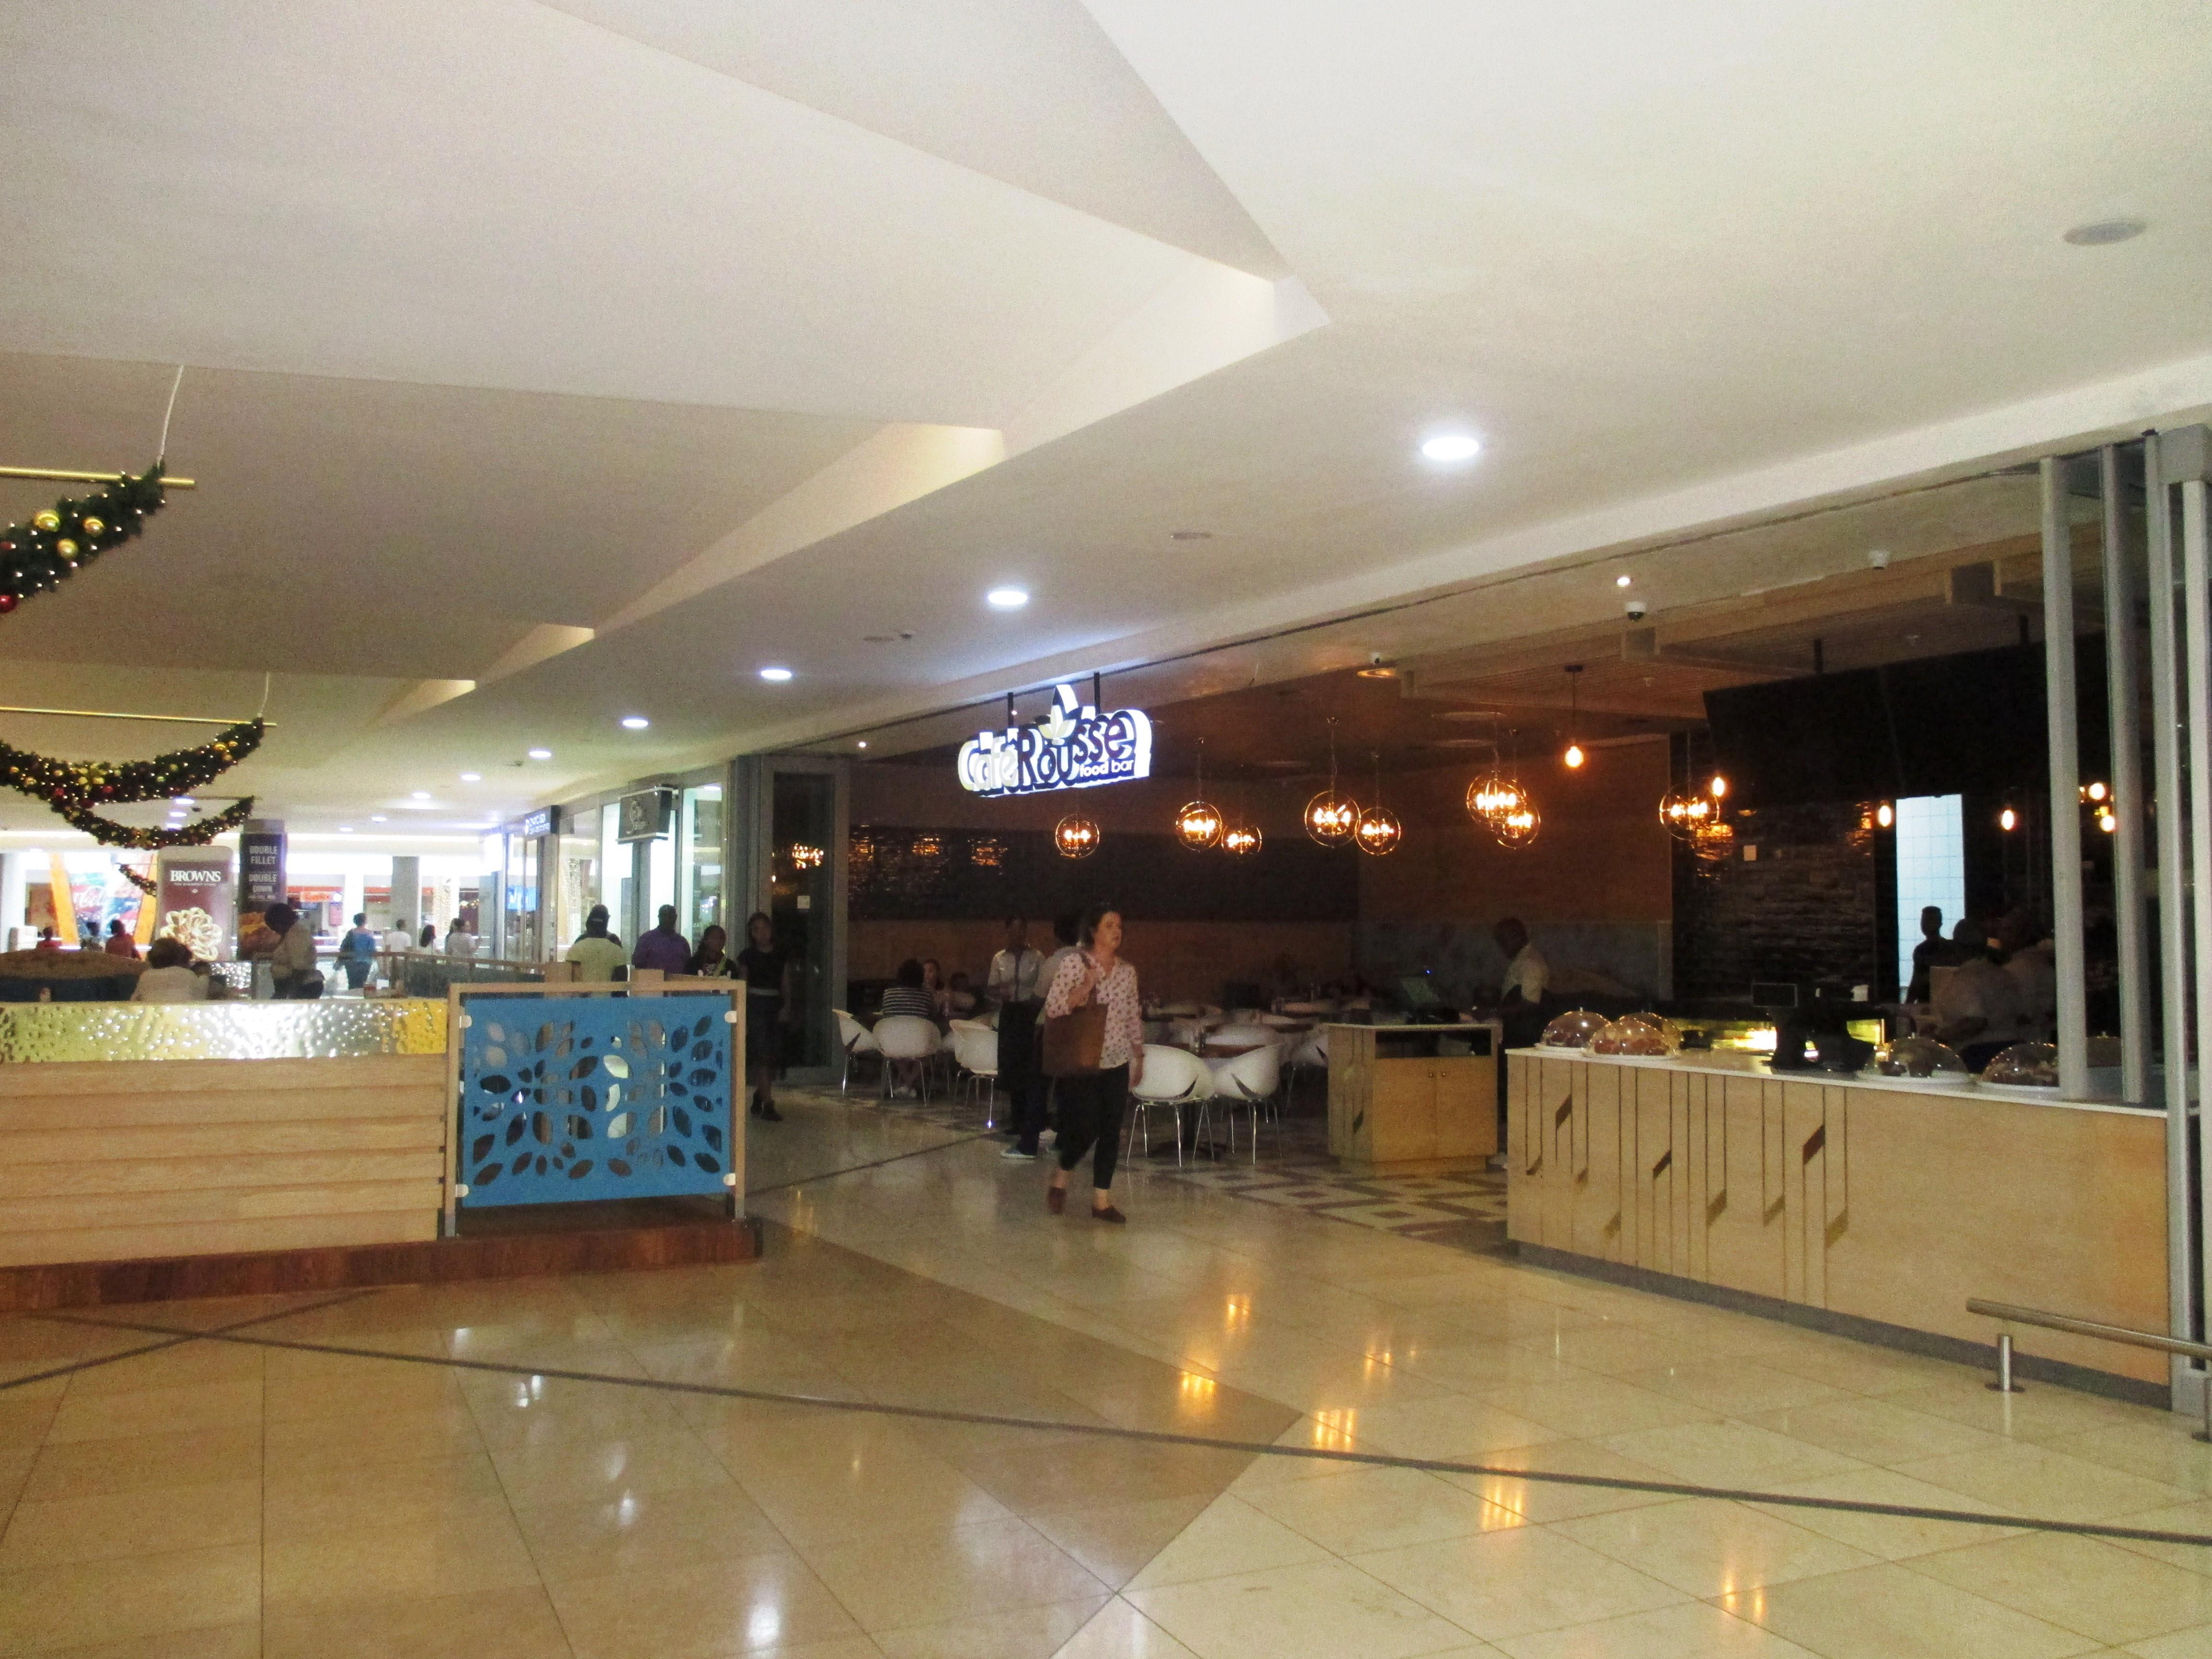 Cafe Rousse